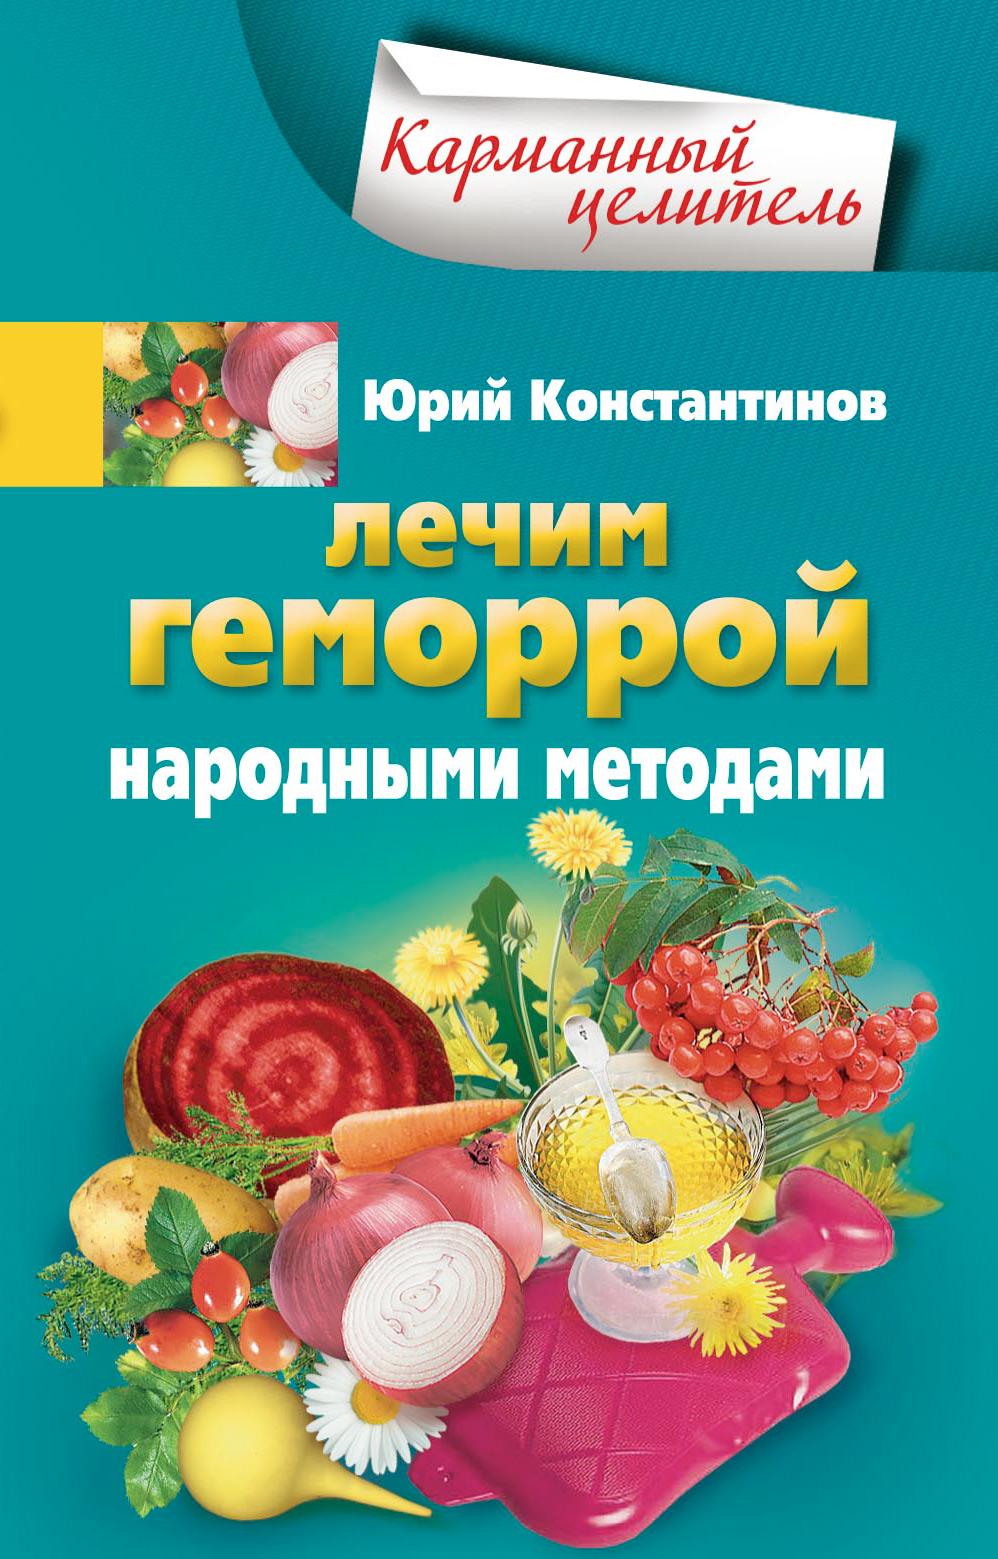 Юрий Константинов Лечим геморрой народными методами константинов ю боремся с анемией народными методами